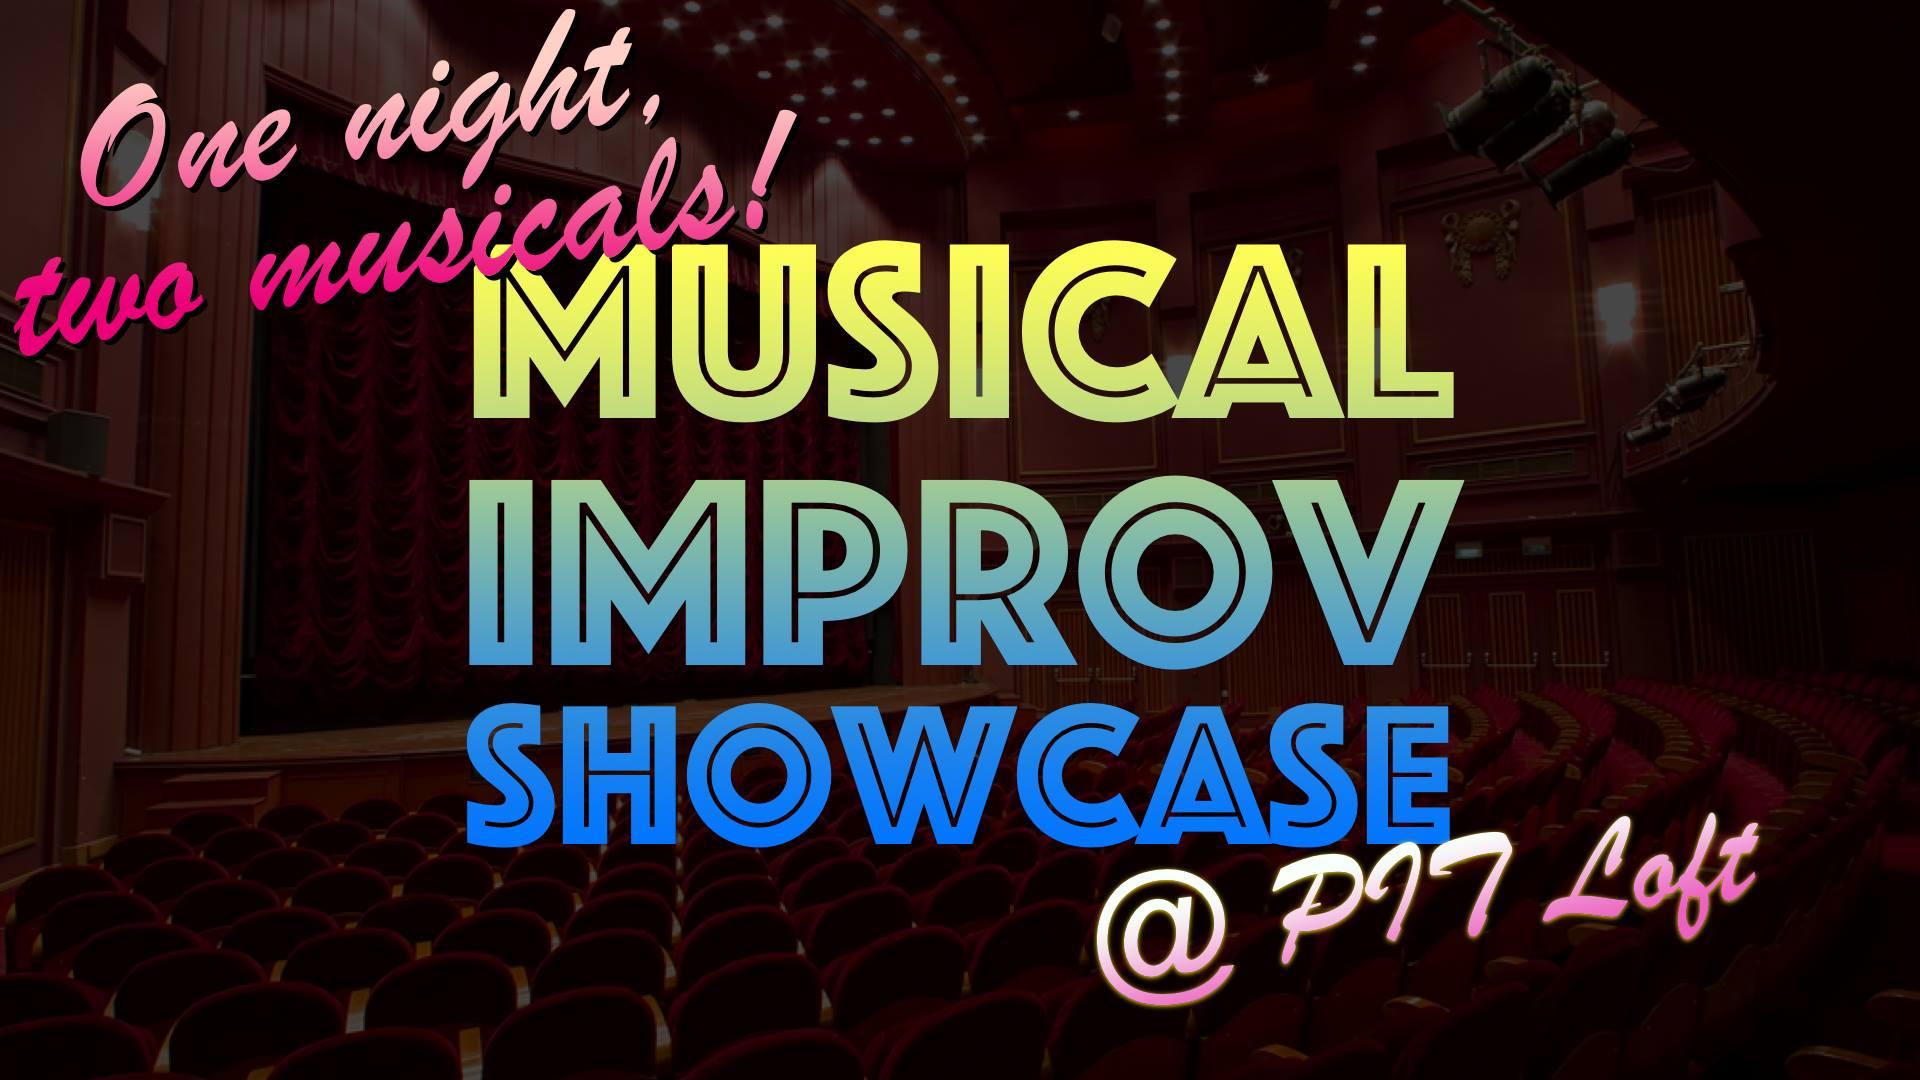 Musical Improv Showcase - Monday, September 9, 2019 • 7 PM – 8 PMThe PIT Loft 154 West 29th Street, New York